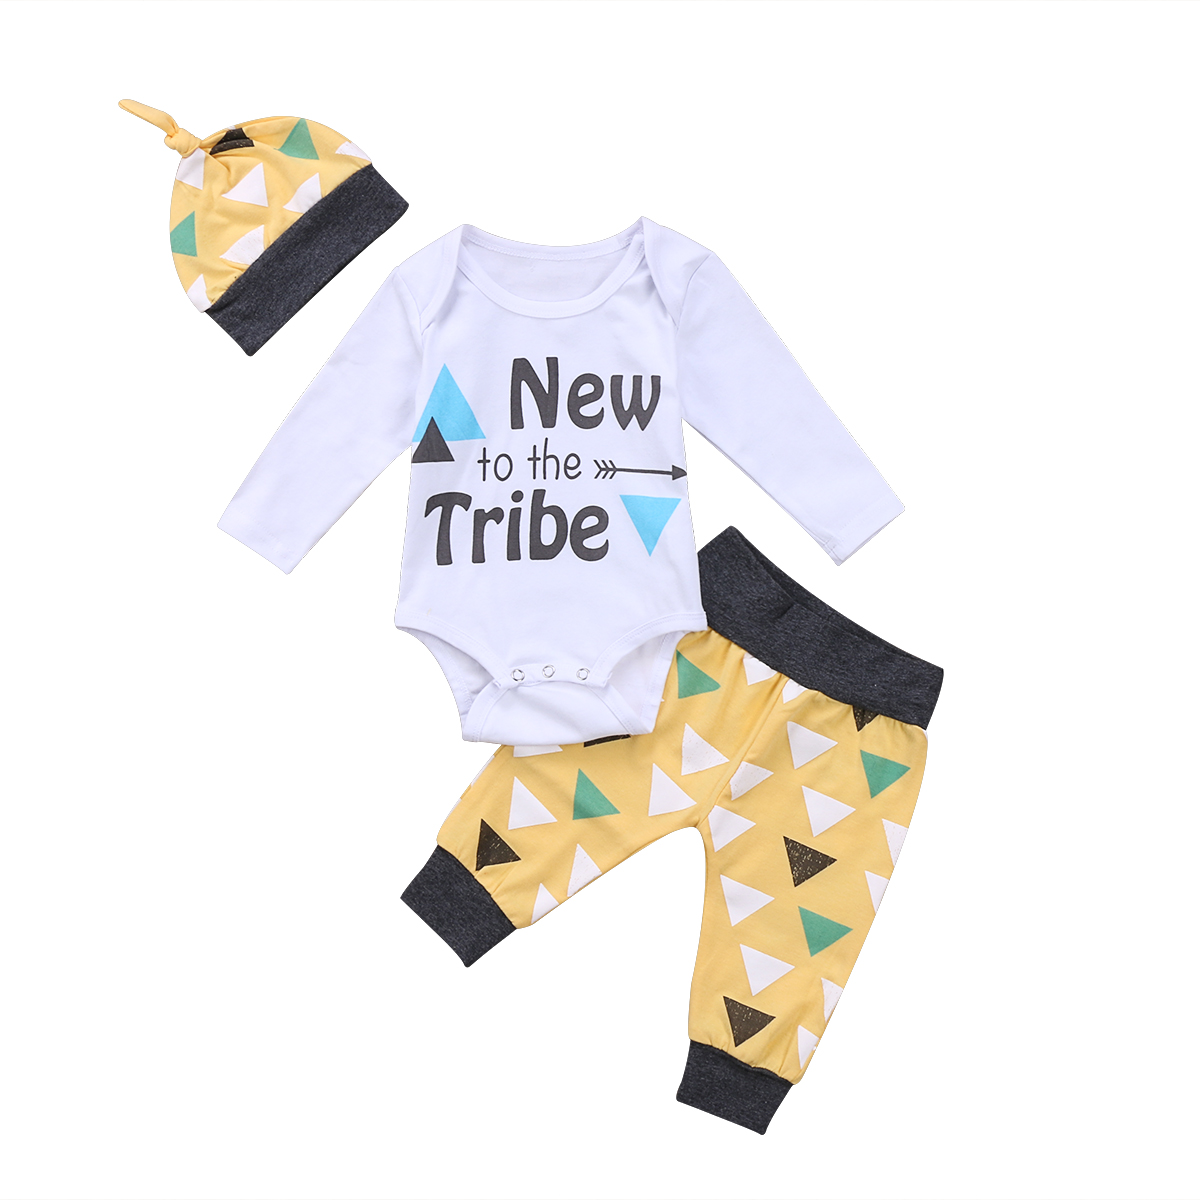 3Pcs Hot Fashion Newborn Infant Baby Boys Letter Bodysuit Triangle Patterns Long Pants Hat Outfits Clothes Set